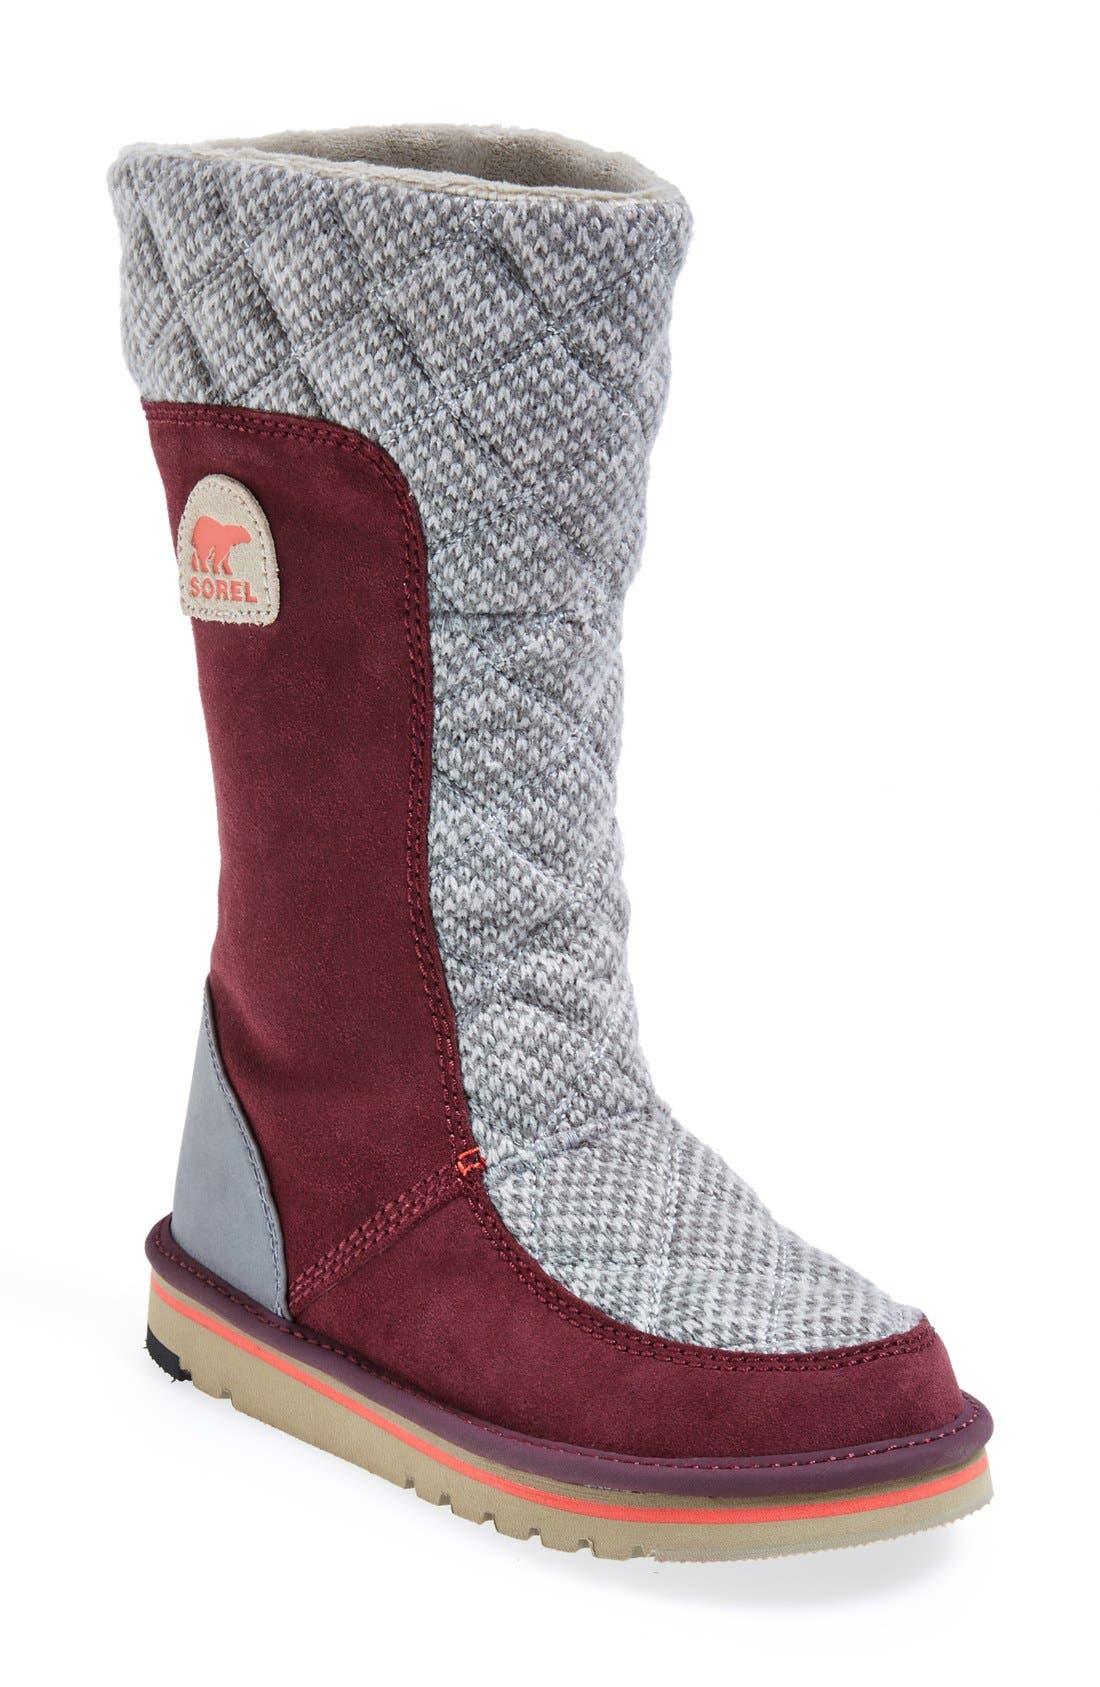 Alternate Image 1 Selected - SOREL 'Campus' Water Resistant Tall Boot (Women)